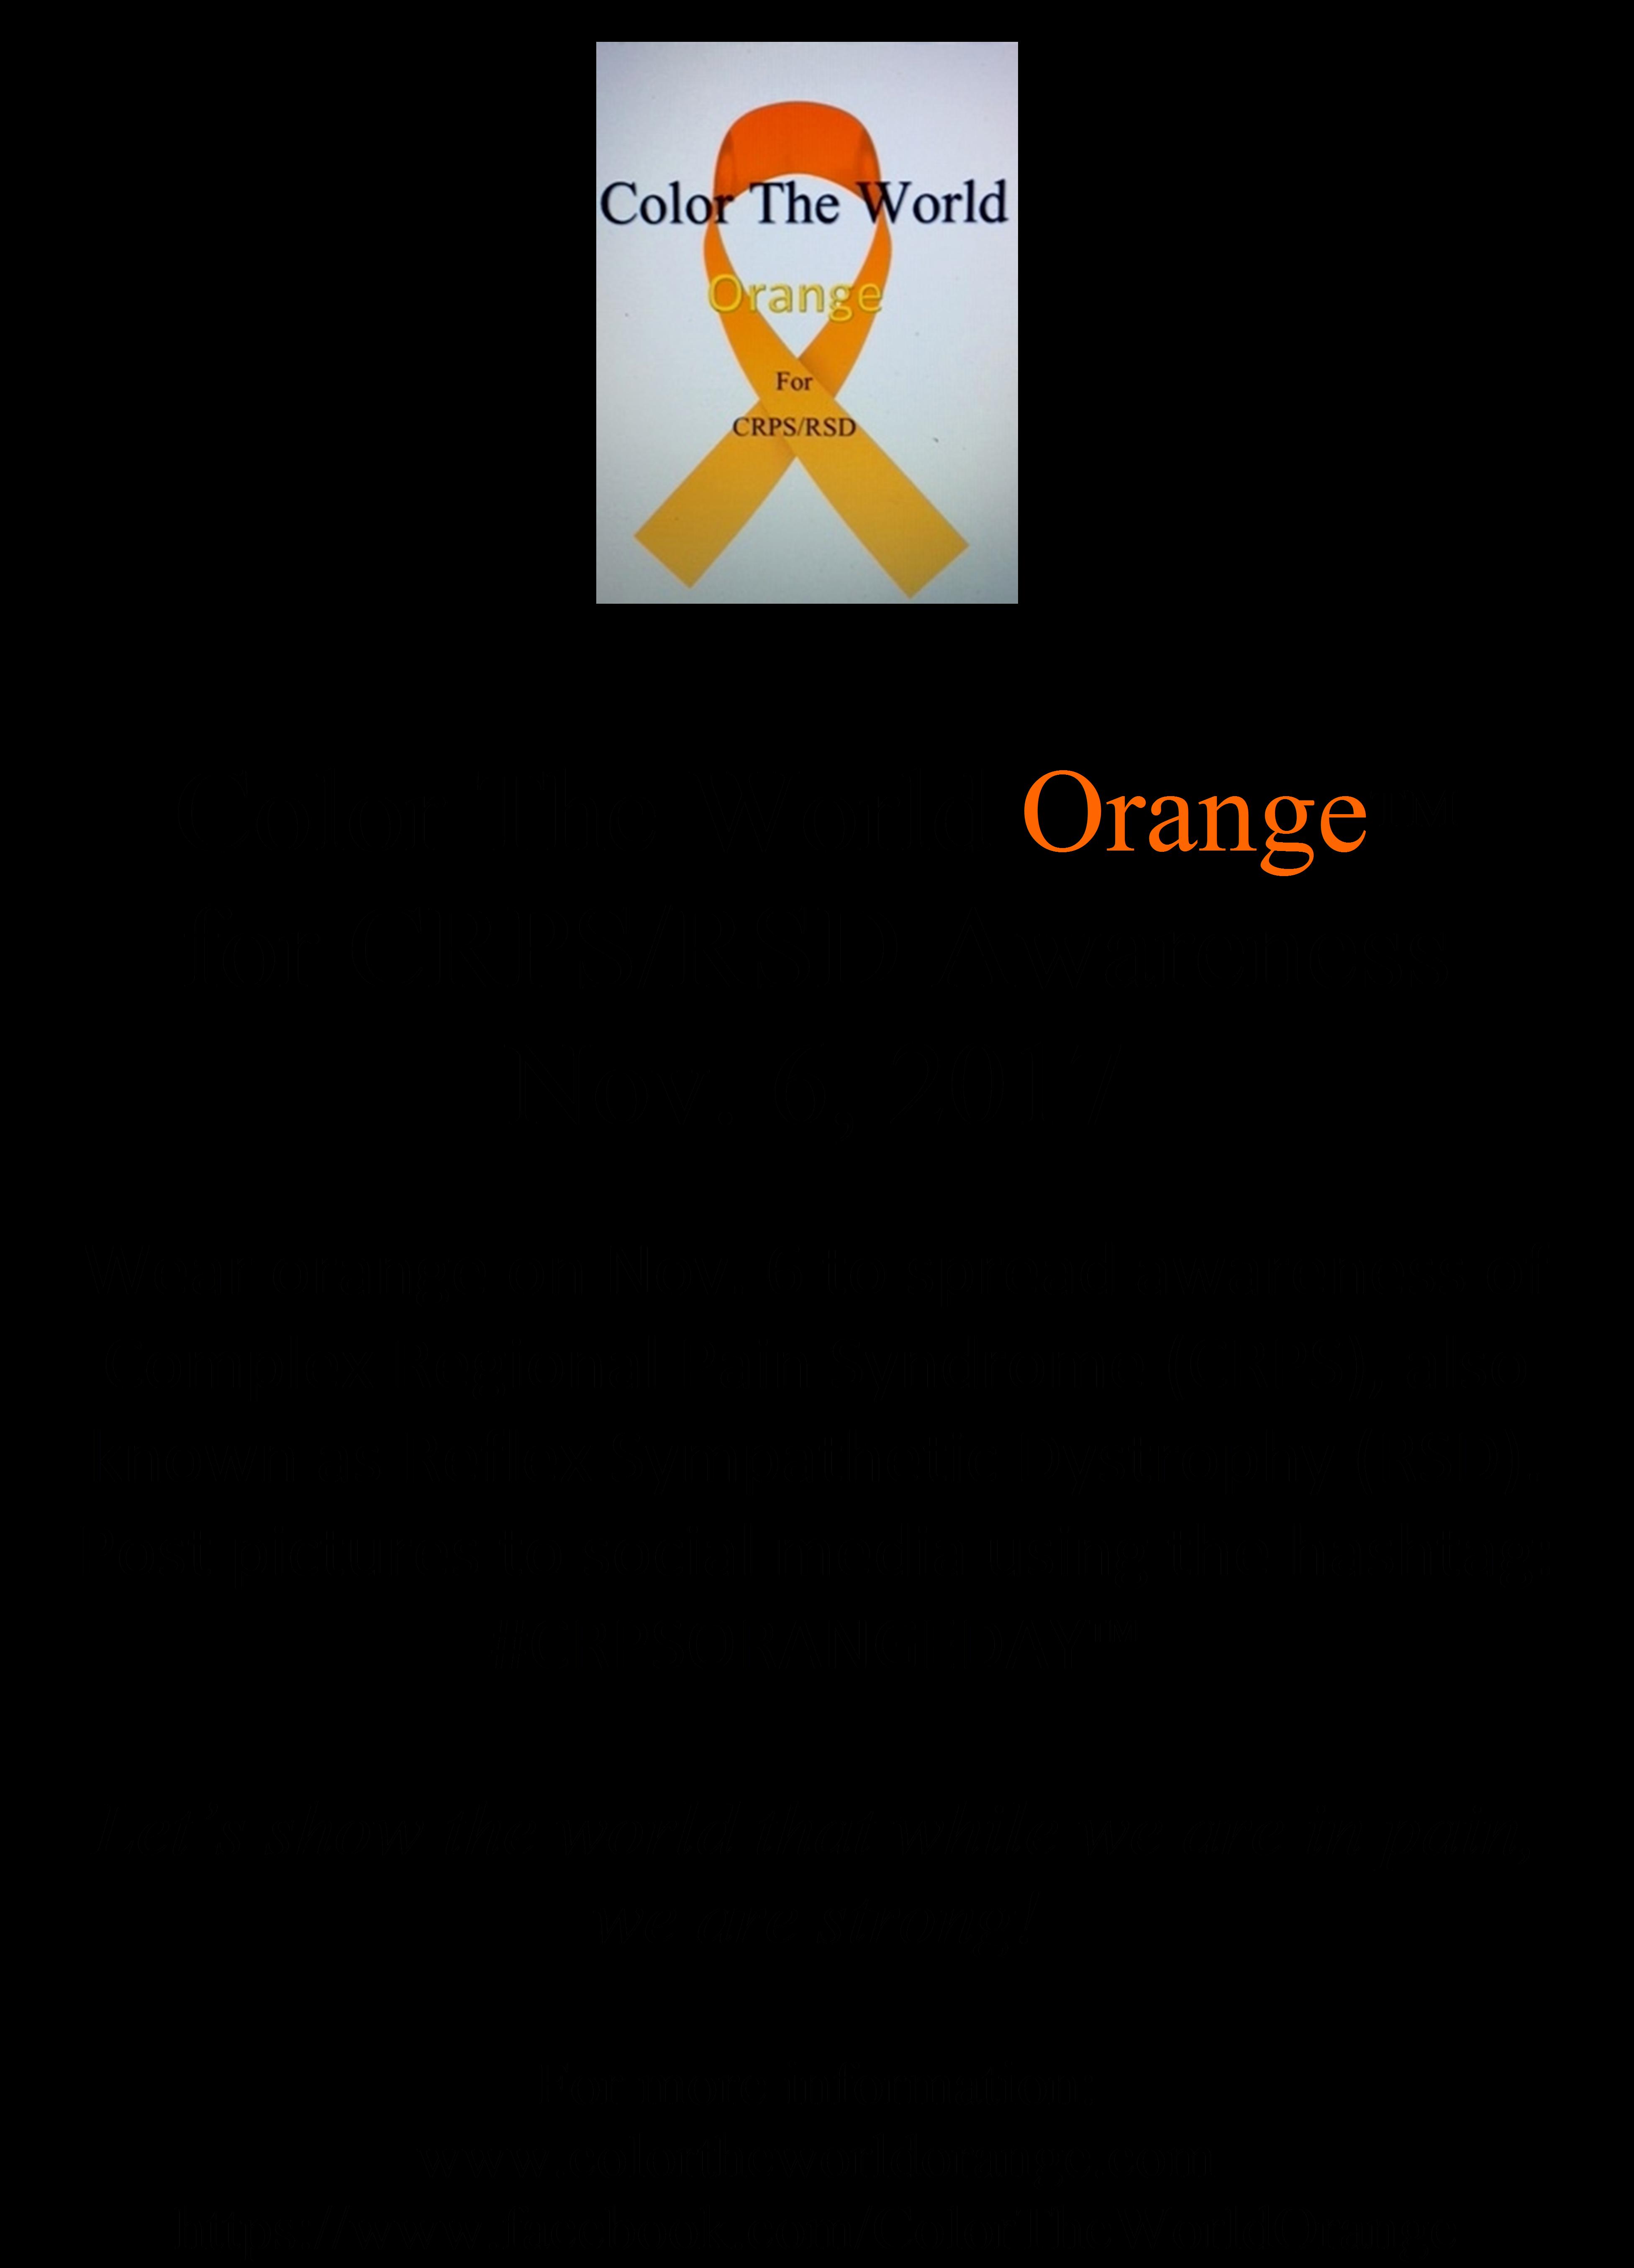 Colour therapy for fibromyalgia - Color The World Orange 2016 Sign